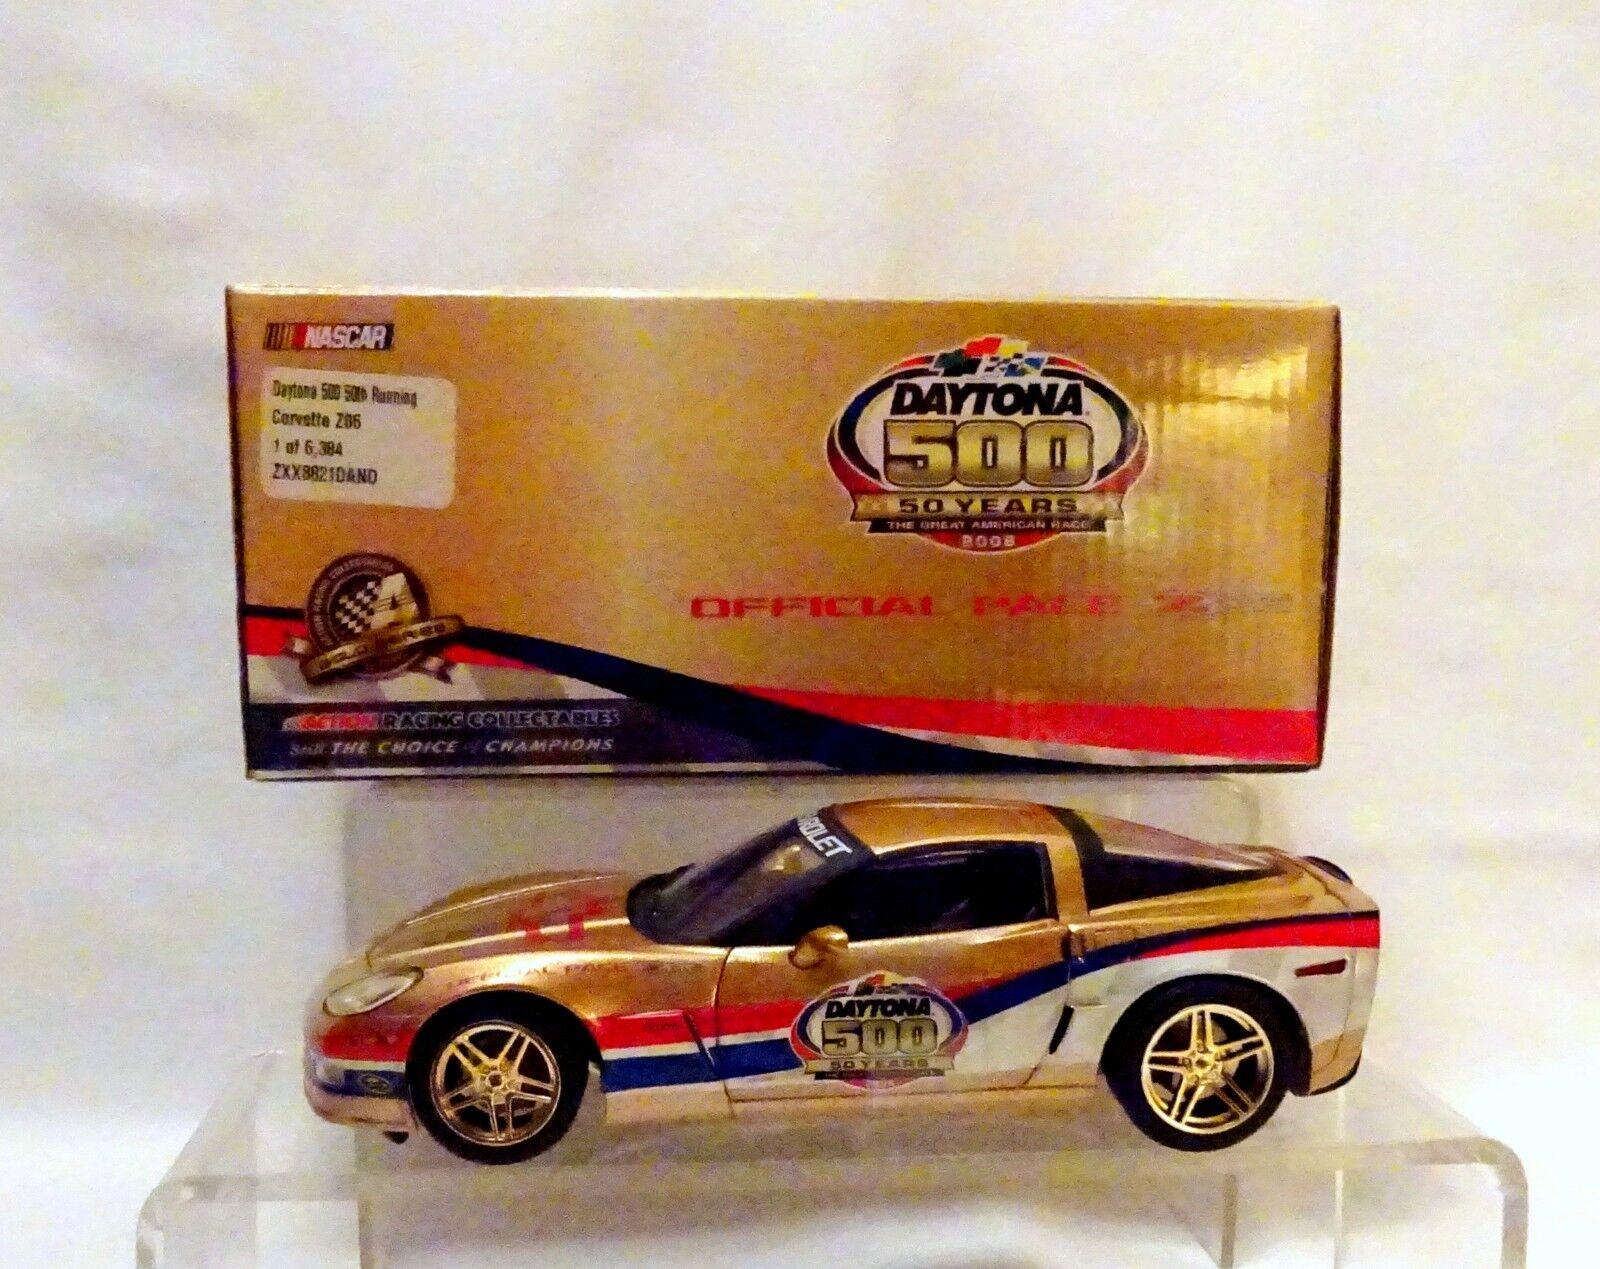 2008 Corvette Z06 Daytona 500 Pace Car 50 Years  1 24 Greenlight......(56)